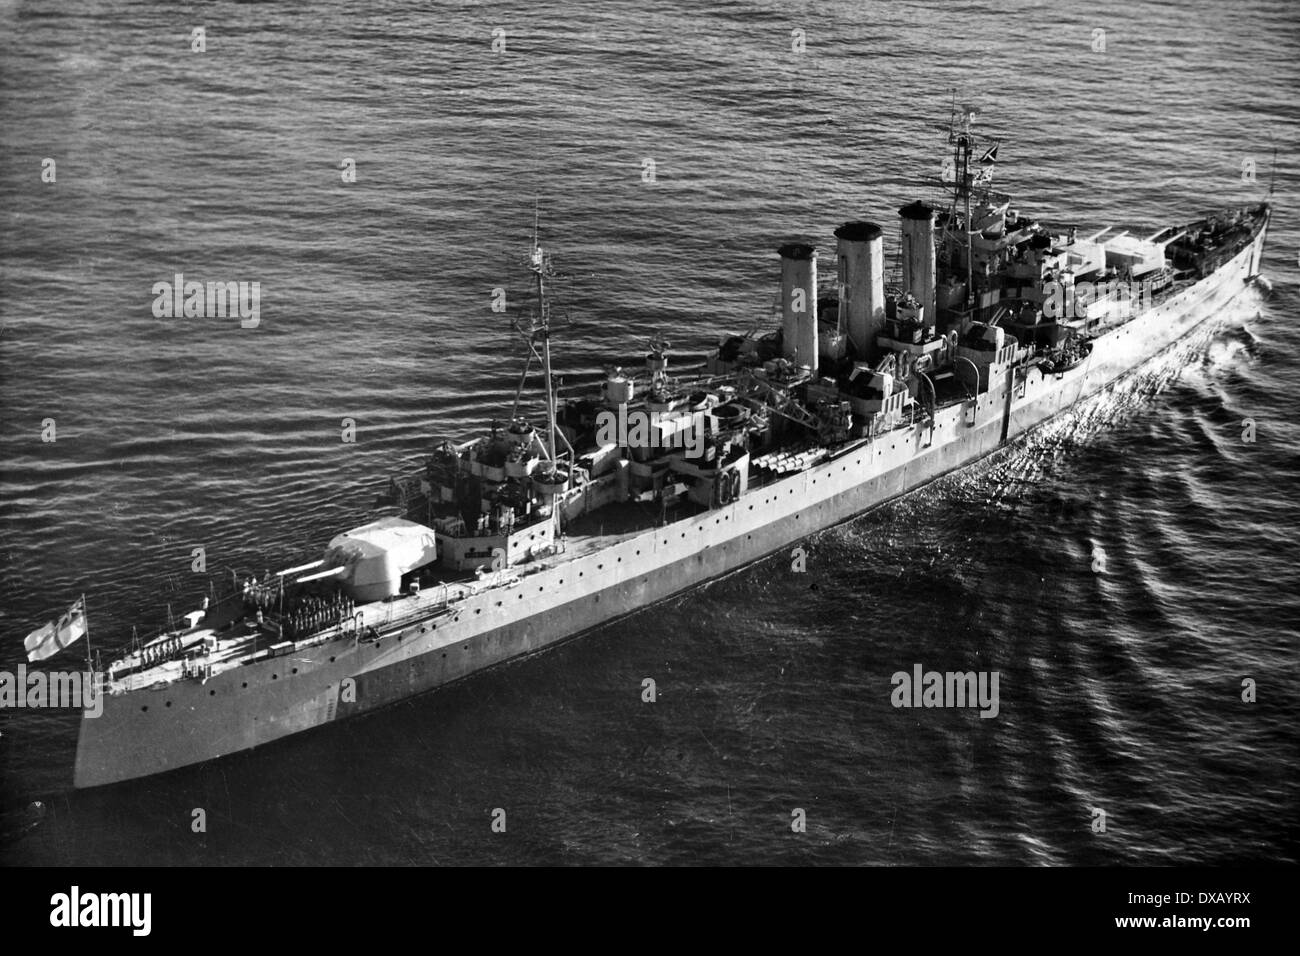 Royal Navy world war two. - Stock Image